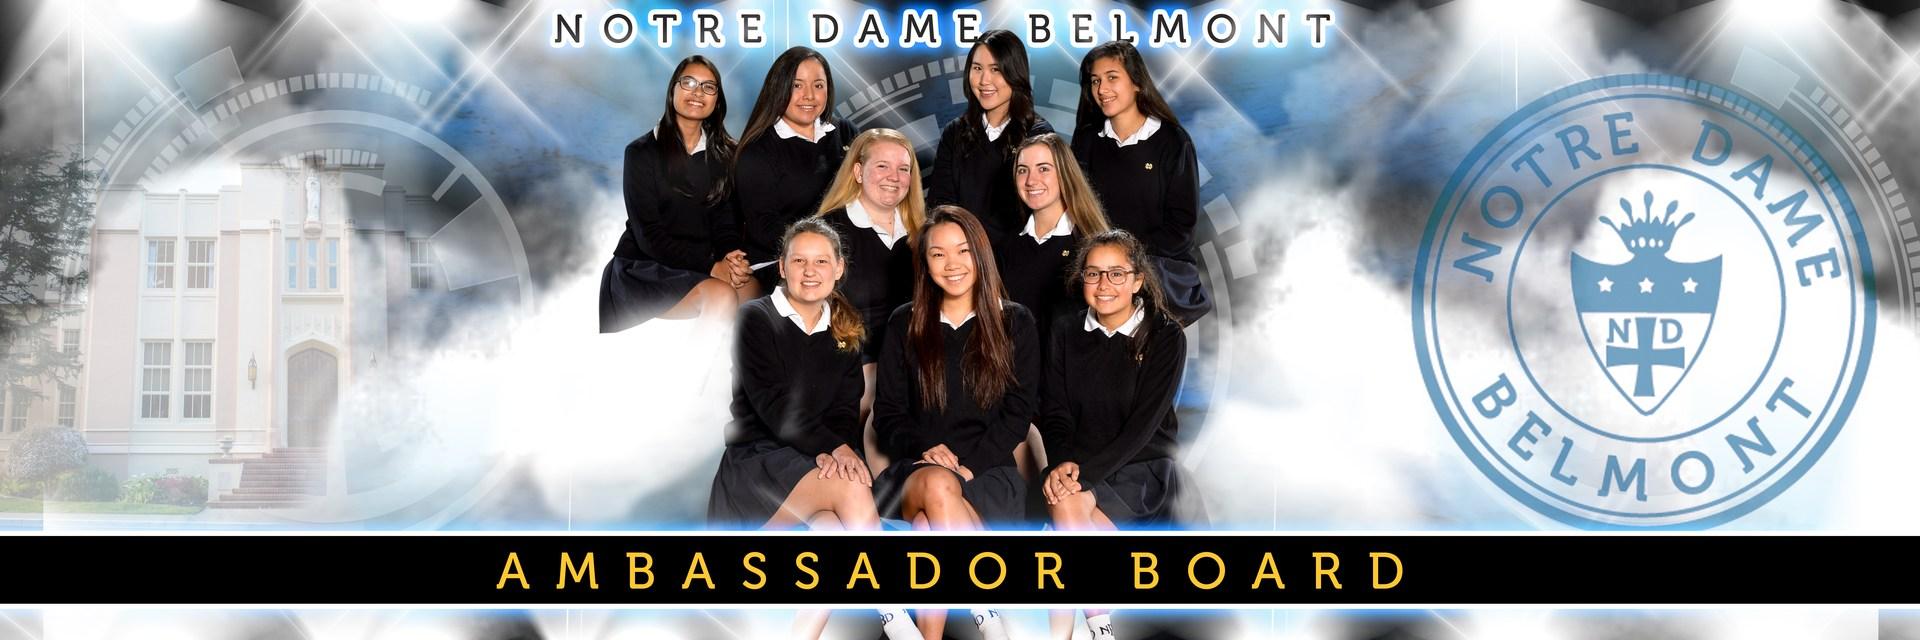 Ambassador Board